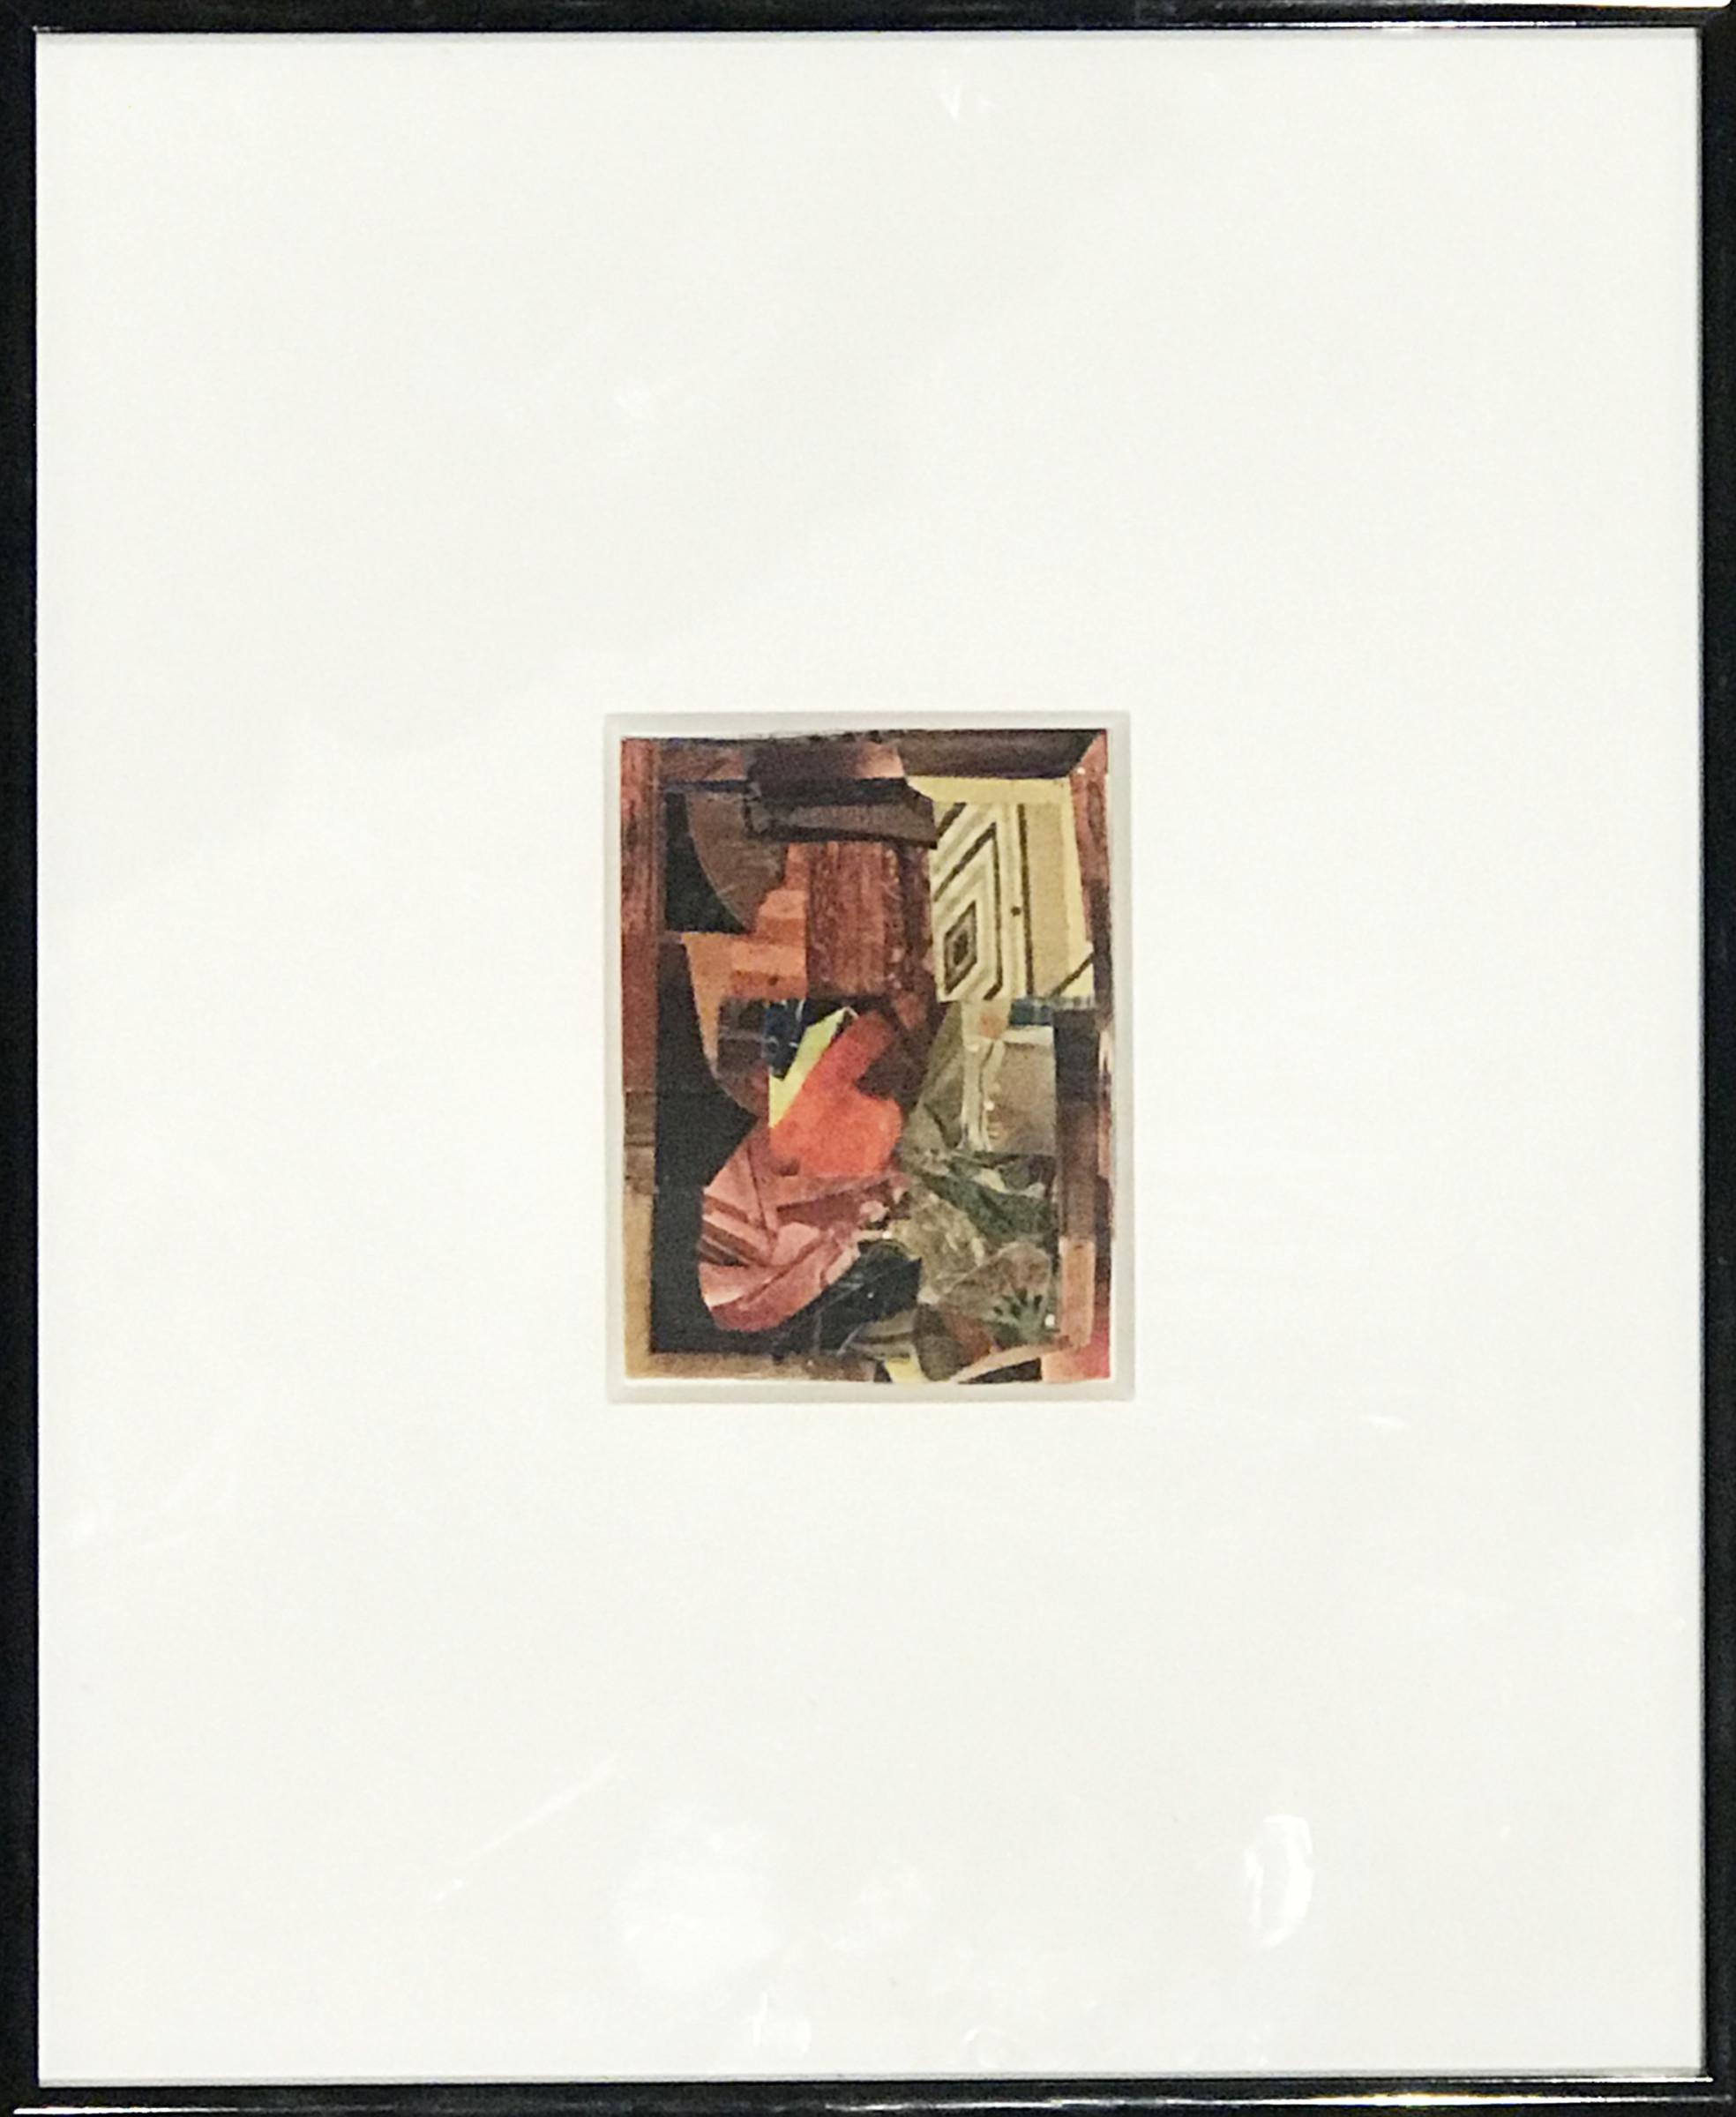 <span class=&#34;link fancybox-details-link&#34;><a href=&#34;/artworks/309-jesse-lott-untitled/&#34;>View Detail Page</a></span><div class=&#34;artist&#34;><strong>Jesse Lott</strong></div> <div class=&#34;title&#34;>Untitled</div> <div class=&#34;medium&#34;>Mixed Media</div> <div class=&#34;dimensions&#34;>3 1/2 x 2 1/2 in<br /> 8.9 x 6.3 cm</div>